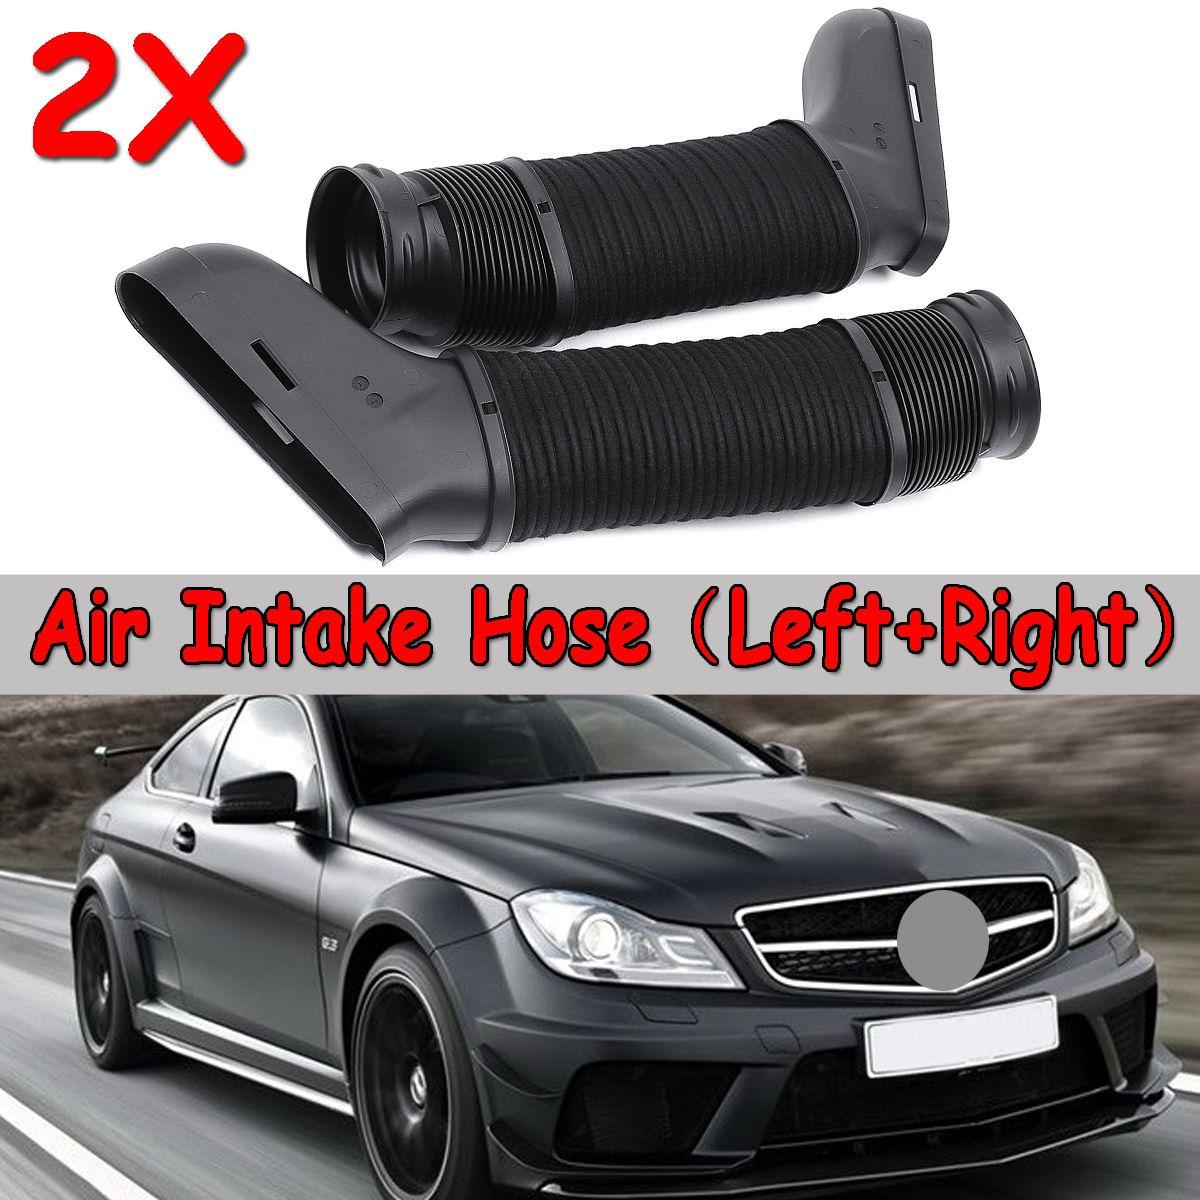 1Pair Car Side Air Intake Duct Hose Black For Mercedes W204 A207 C207 S212 V212 W212 2720903682 Intake Manifold For original Car